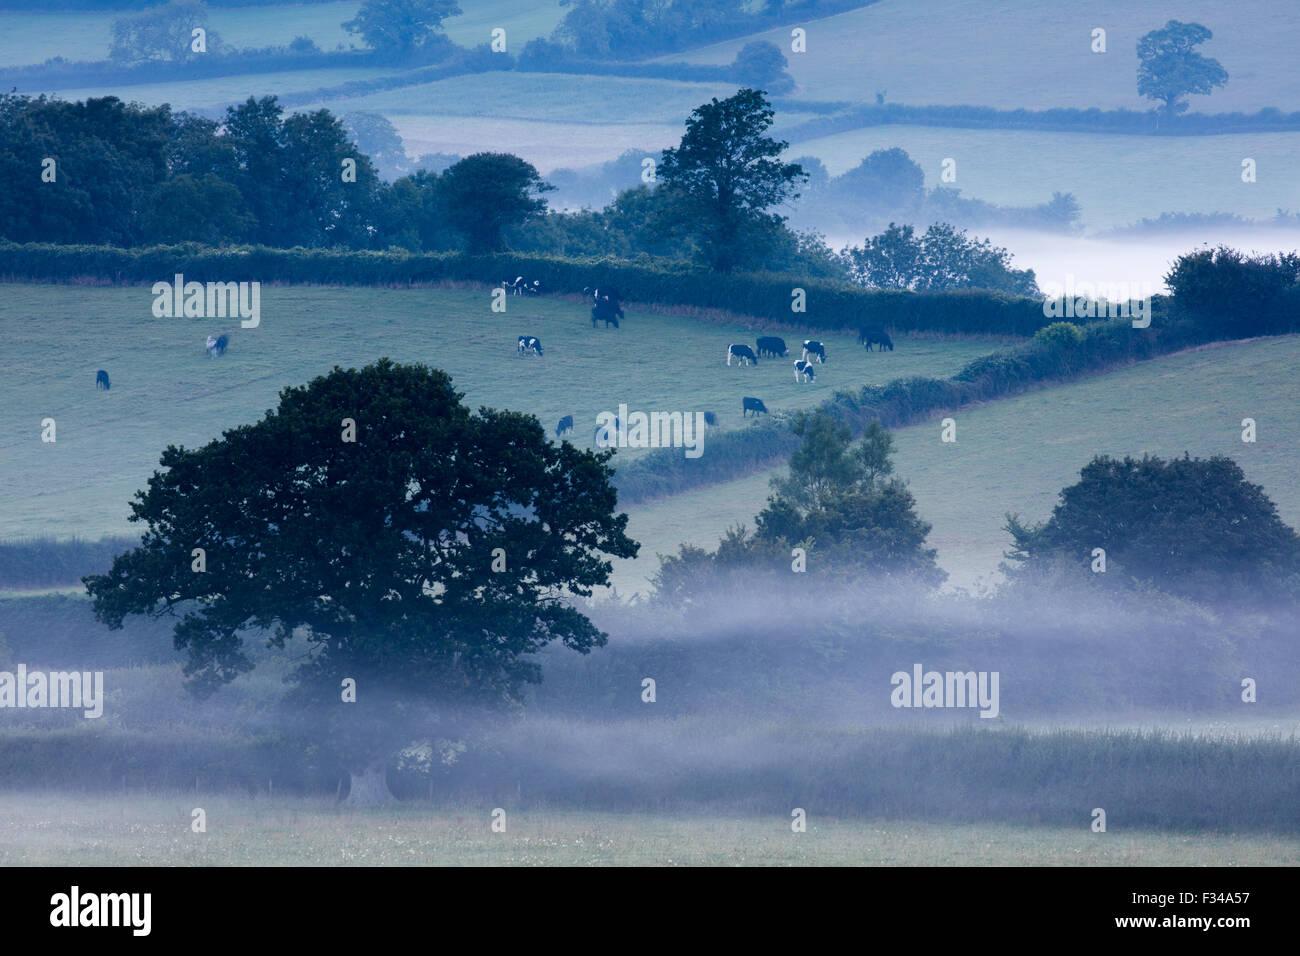 Un matin brumeux près de Milborne Wick, Somerset, England, UK Photo Stock